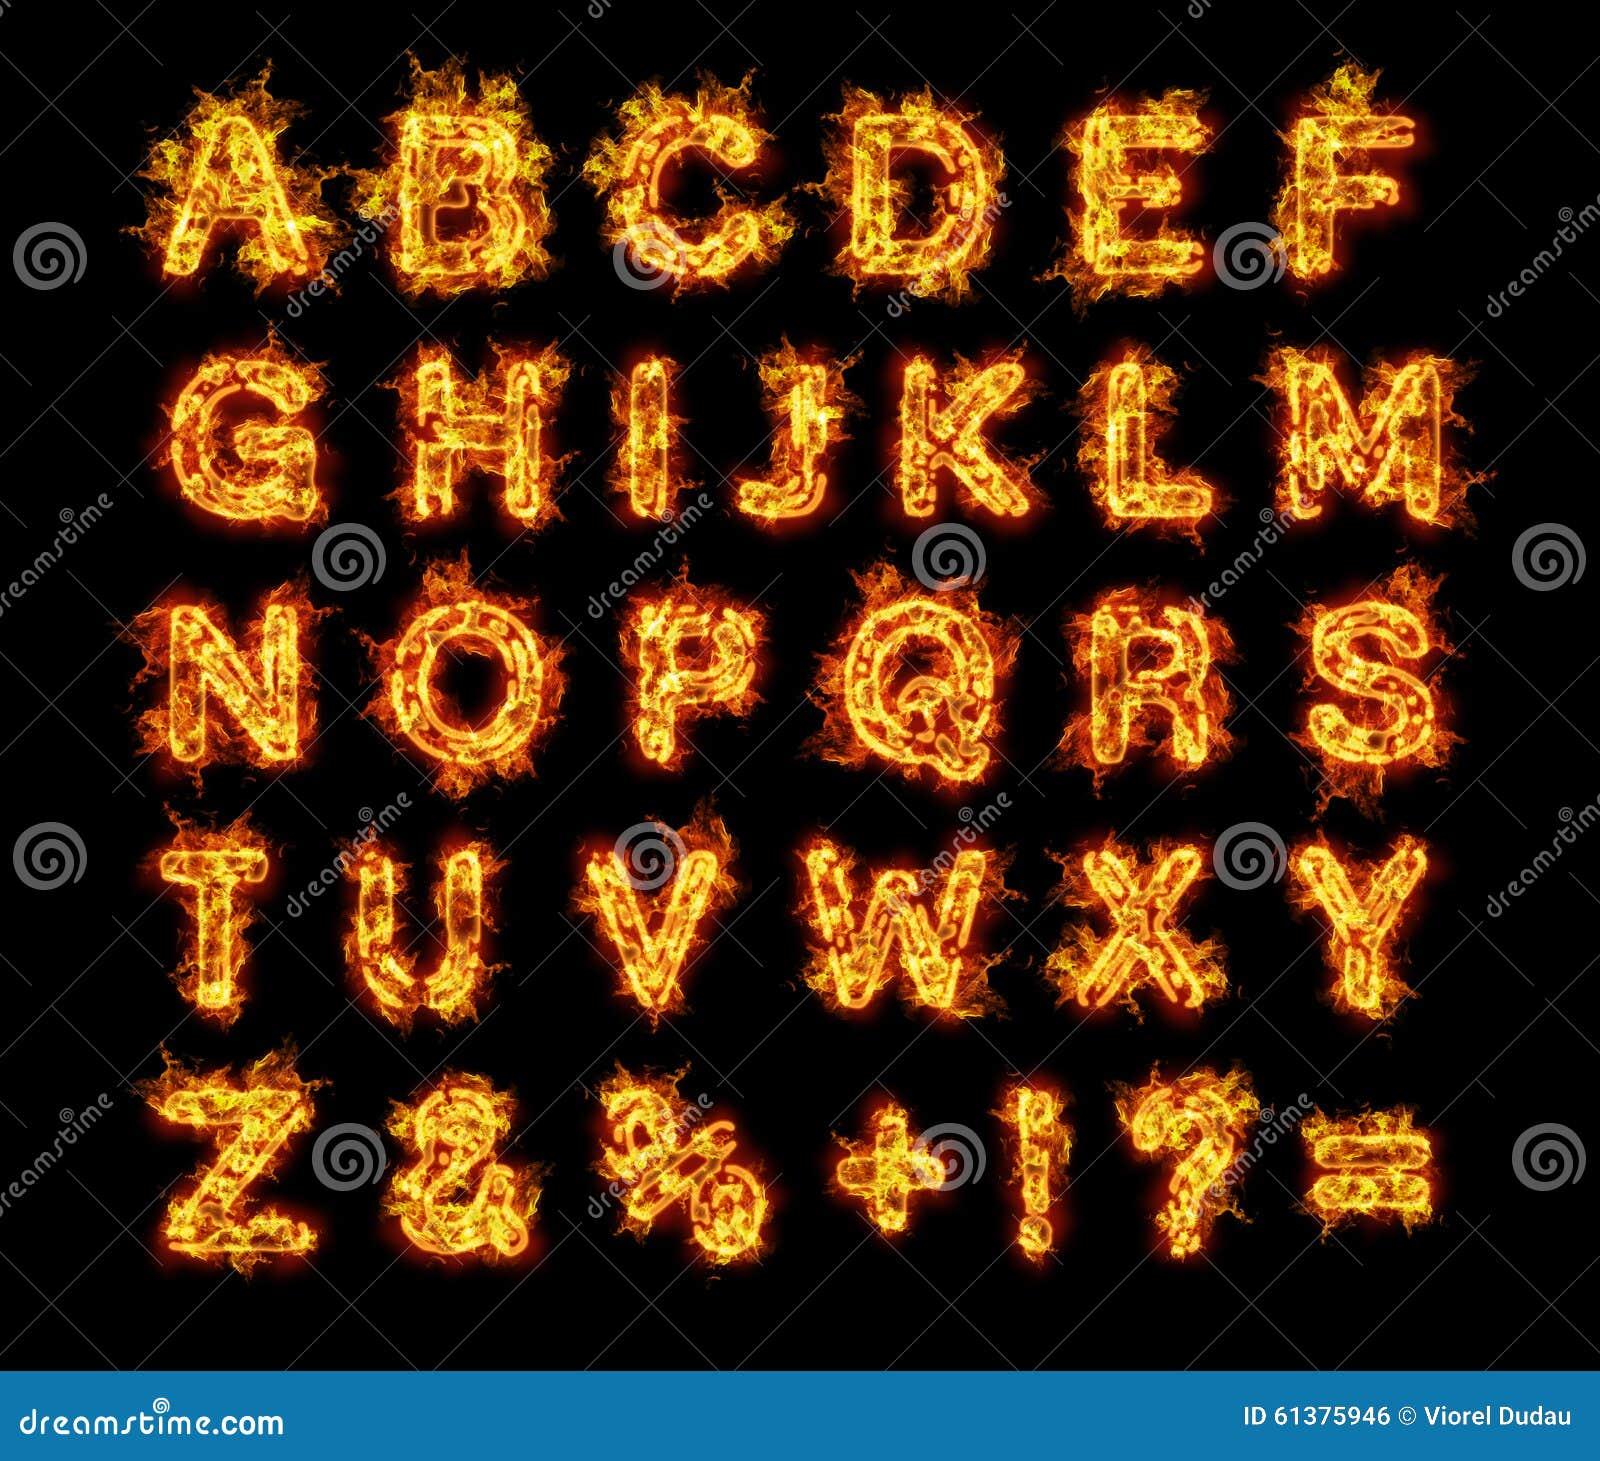 lettres br lantes d 39 alphabet du feu de flammes illustration stock image 61375946. Black Bedroom Furniture Sets. Home Design Ideas